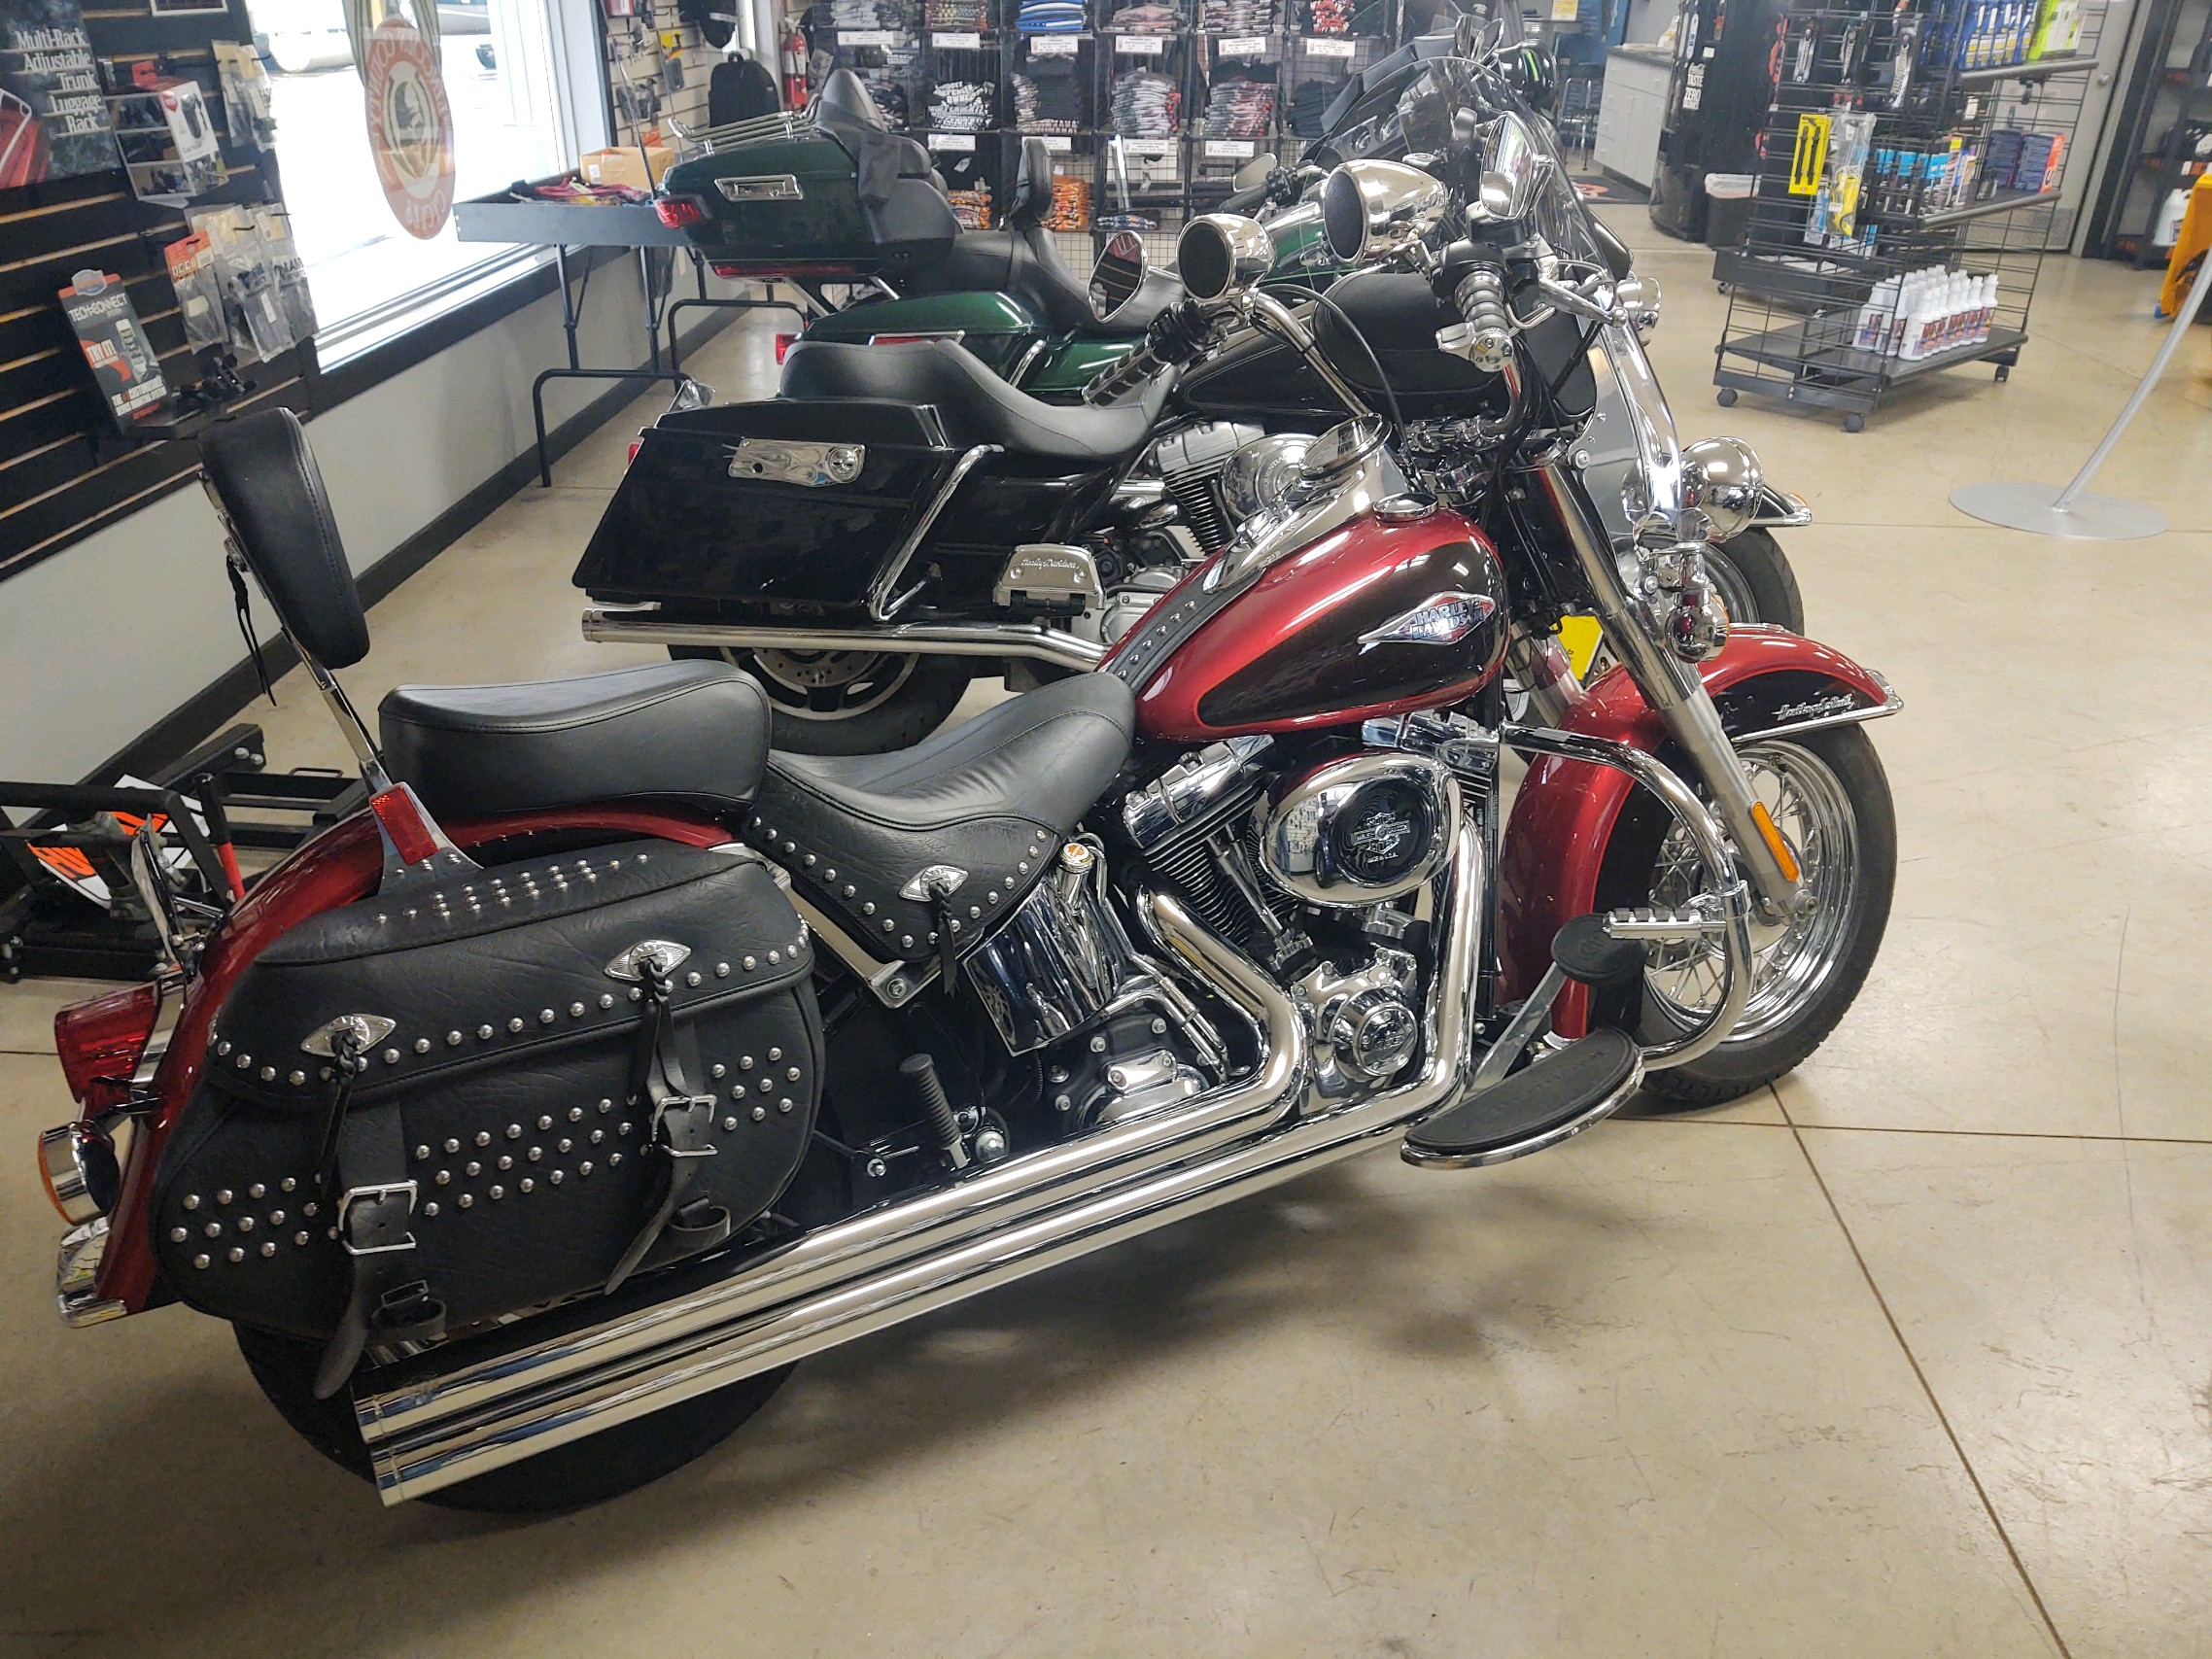 SOLD – 2012 Harley-Davidson Heritage Softail